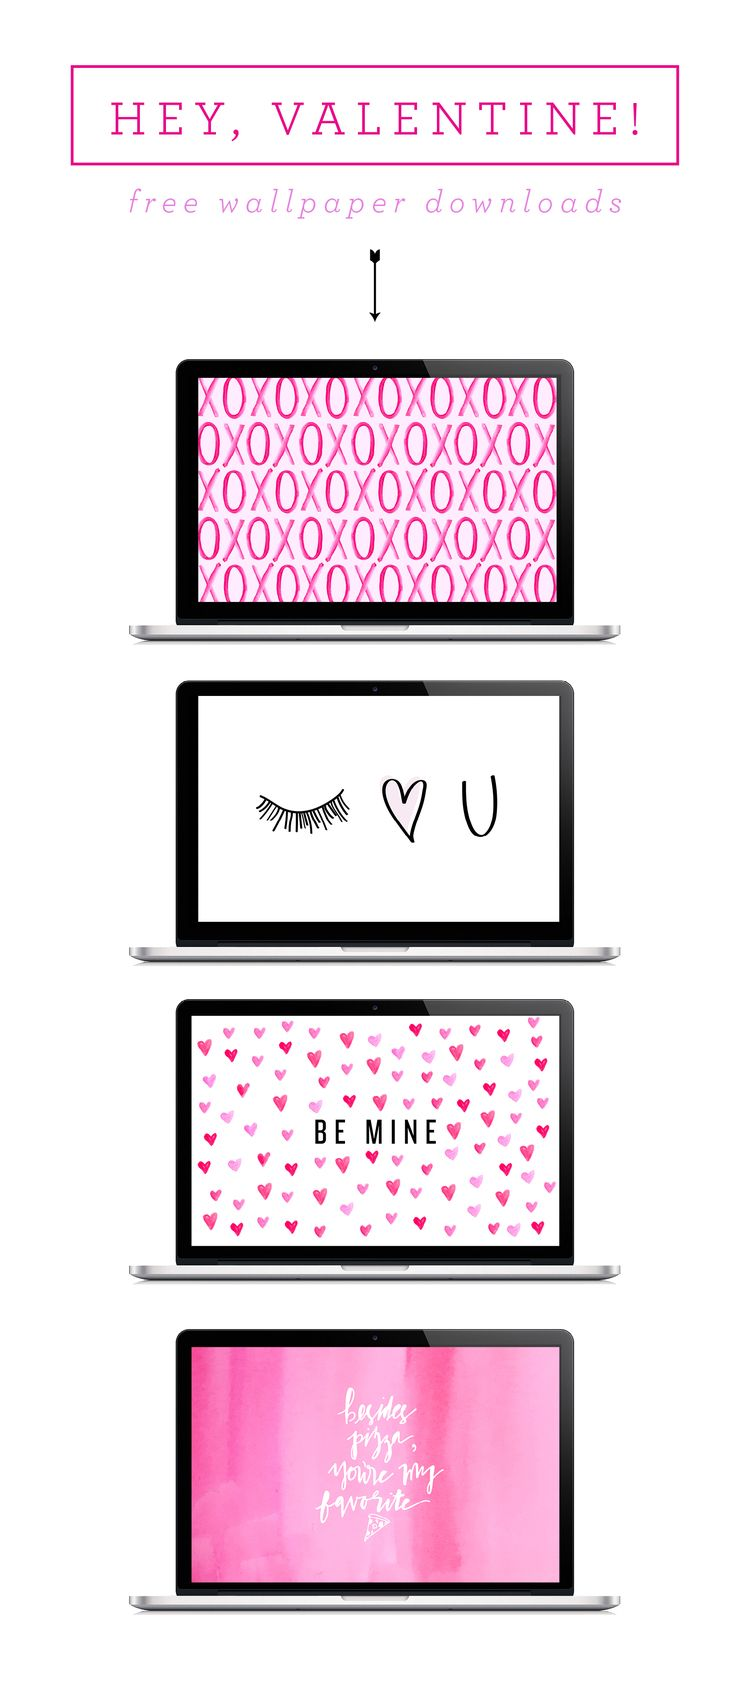 Free Valentines Day Wallpaper Downloads Flyoverdesignco